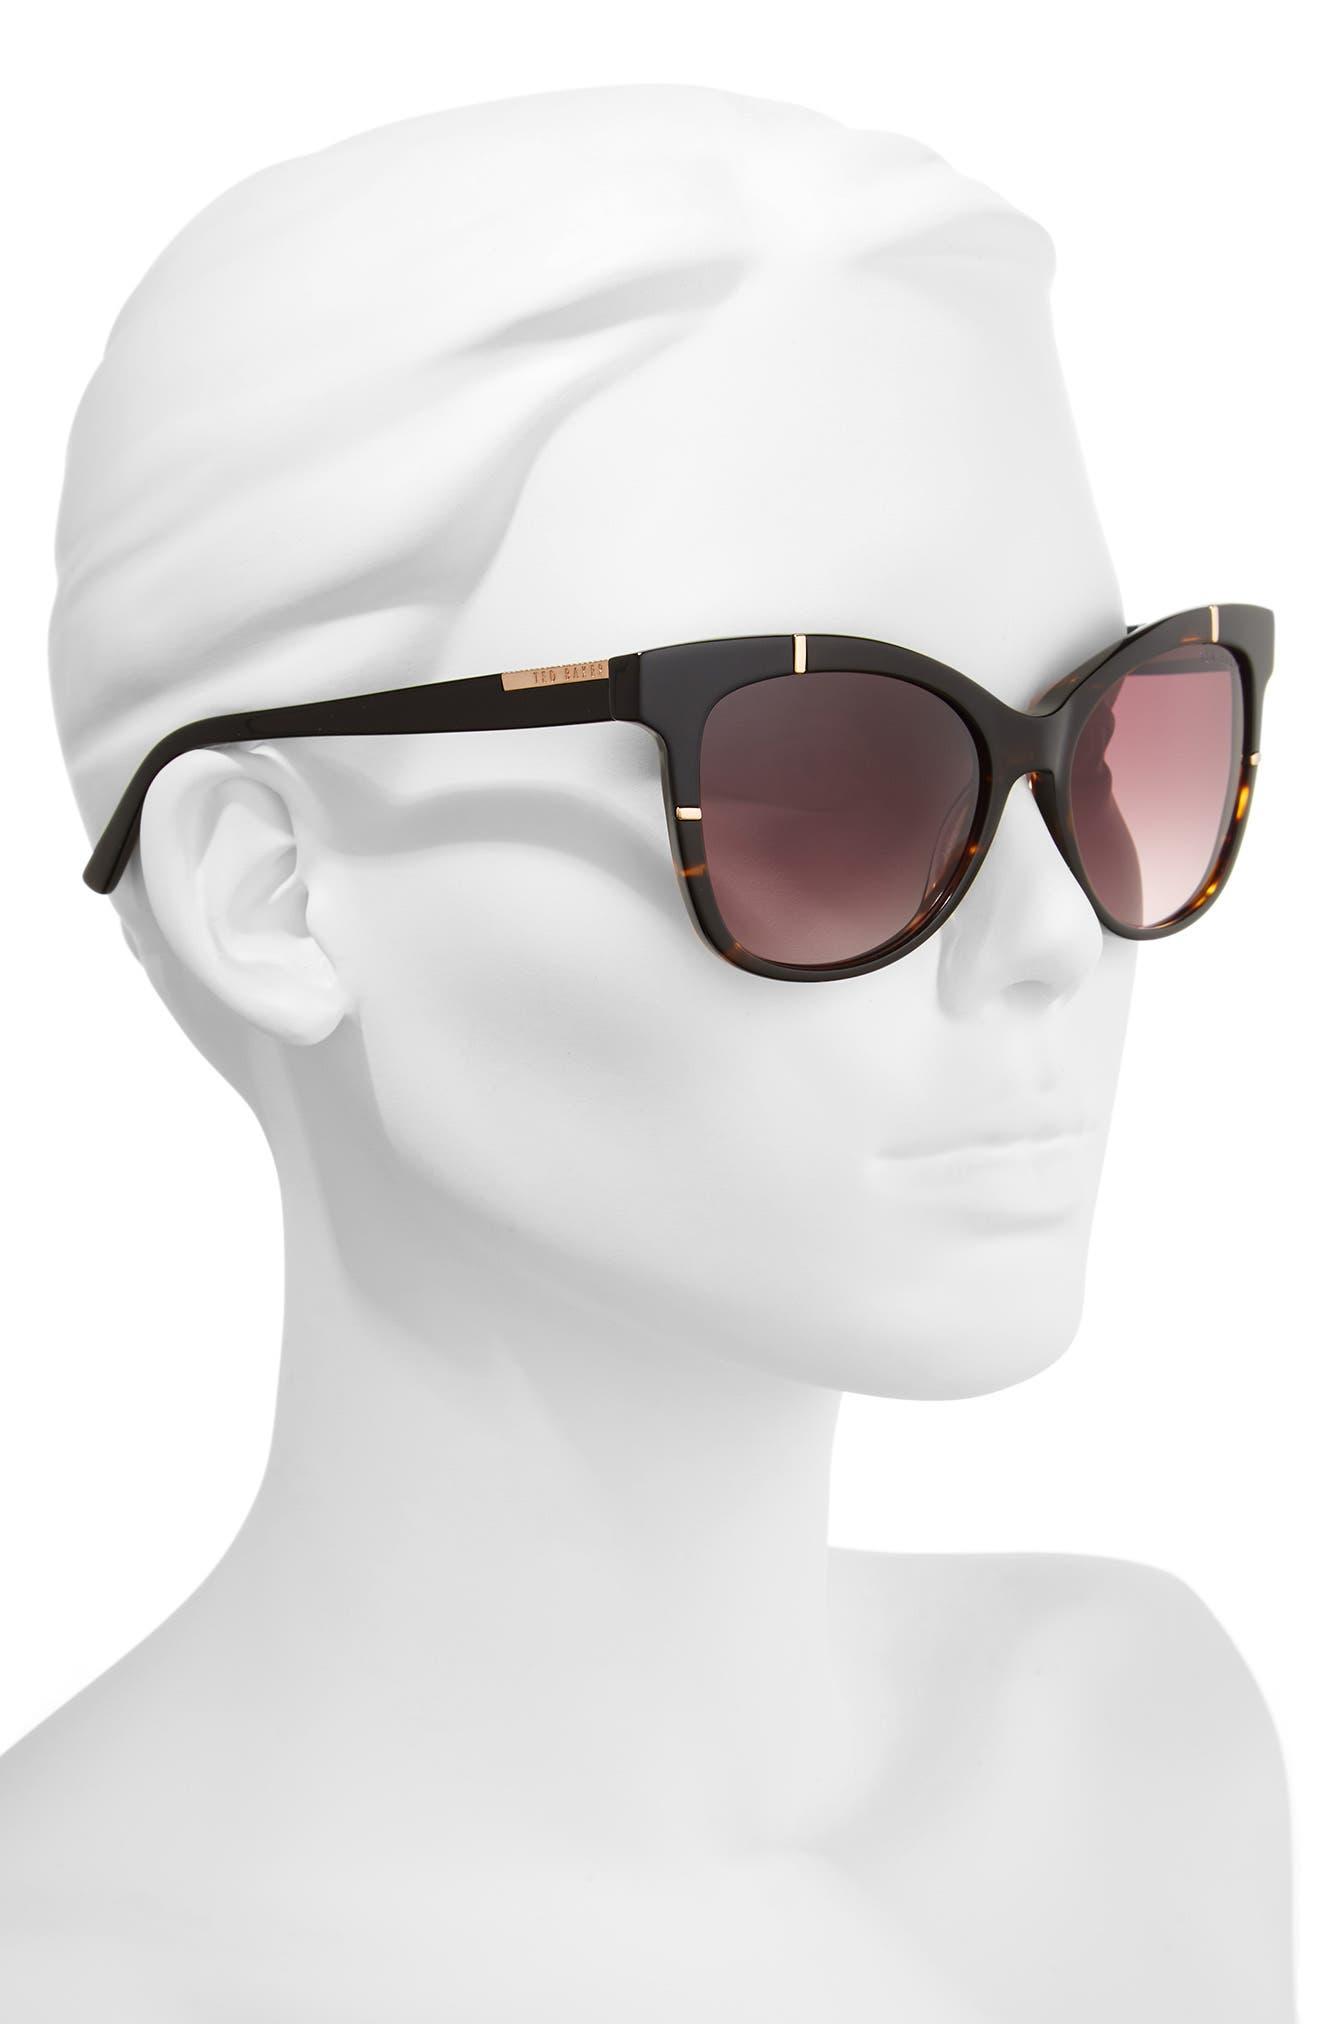 55mm Square Cat Eye Sunglasses,                             Alternate thumbnail 2, color,                             TORTOISE